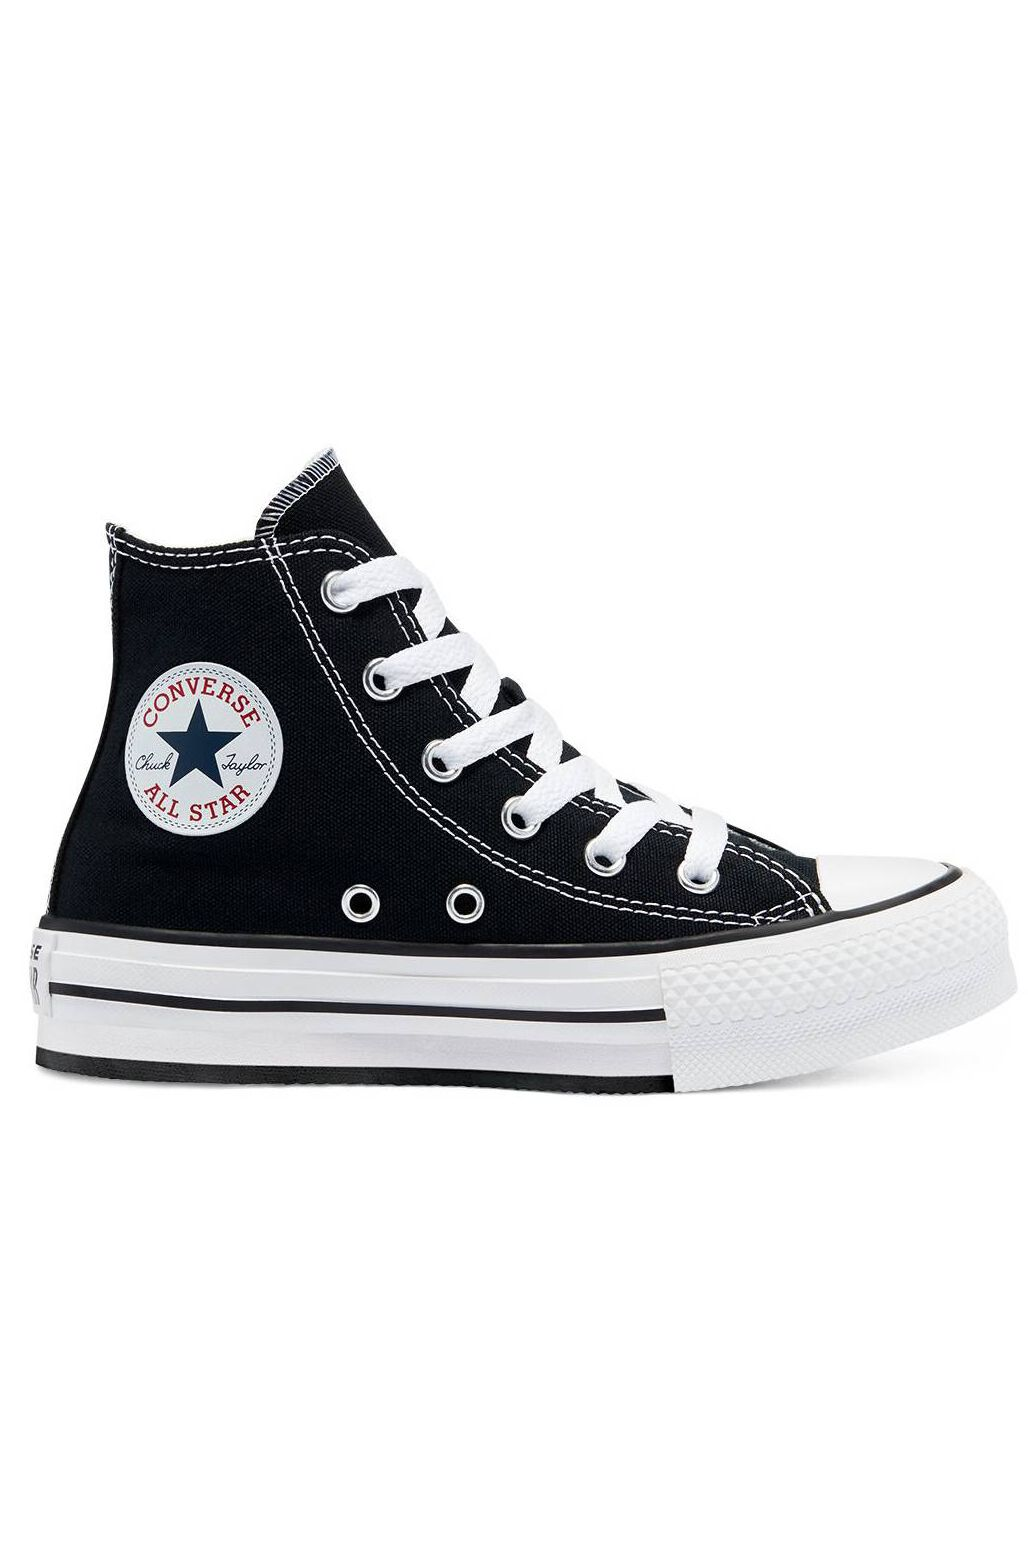 Converse Shoes CHUCK TAYLOR ALL STAR EVA LIFT HI Black/White/Black